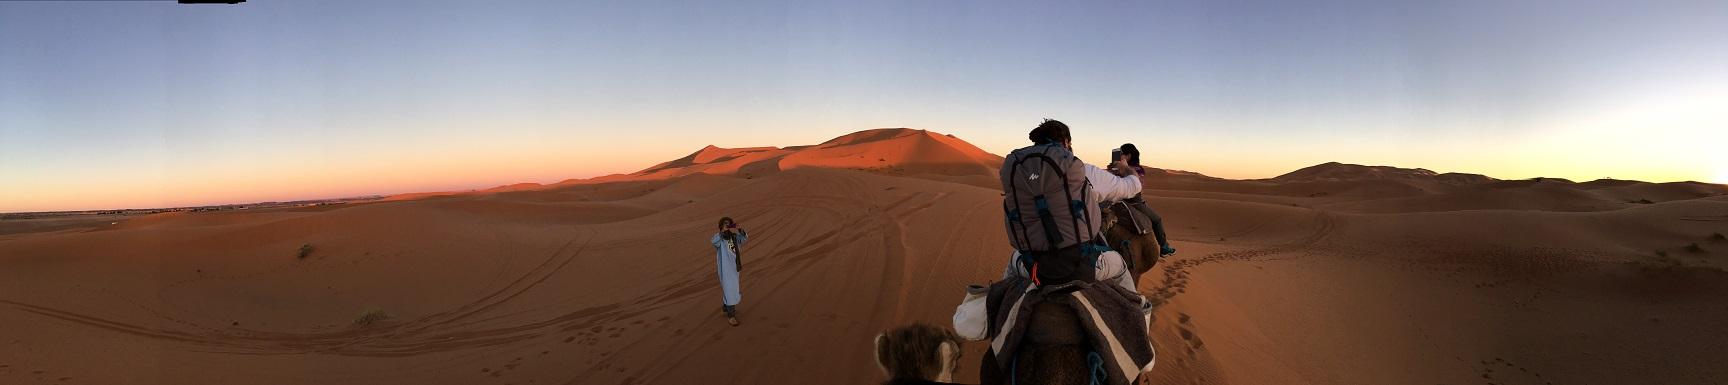 passeio camelo deserto marrocos